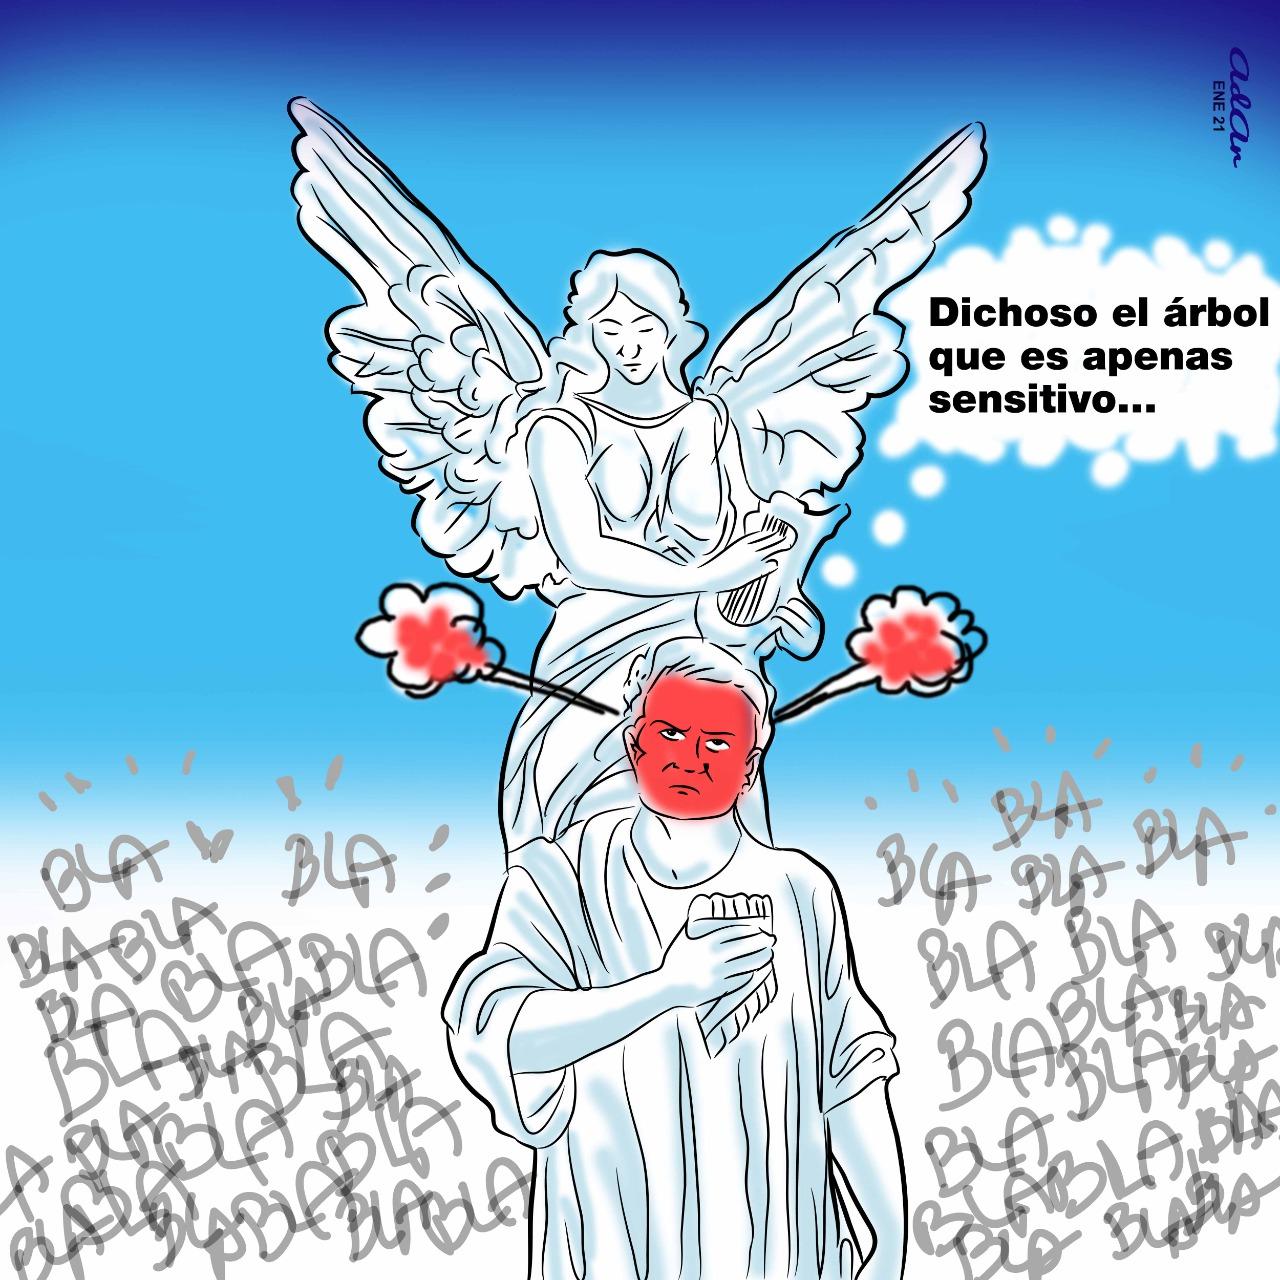 caricatura-ip-nicaragua 12 01